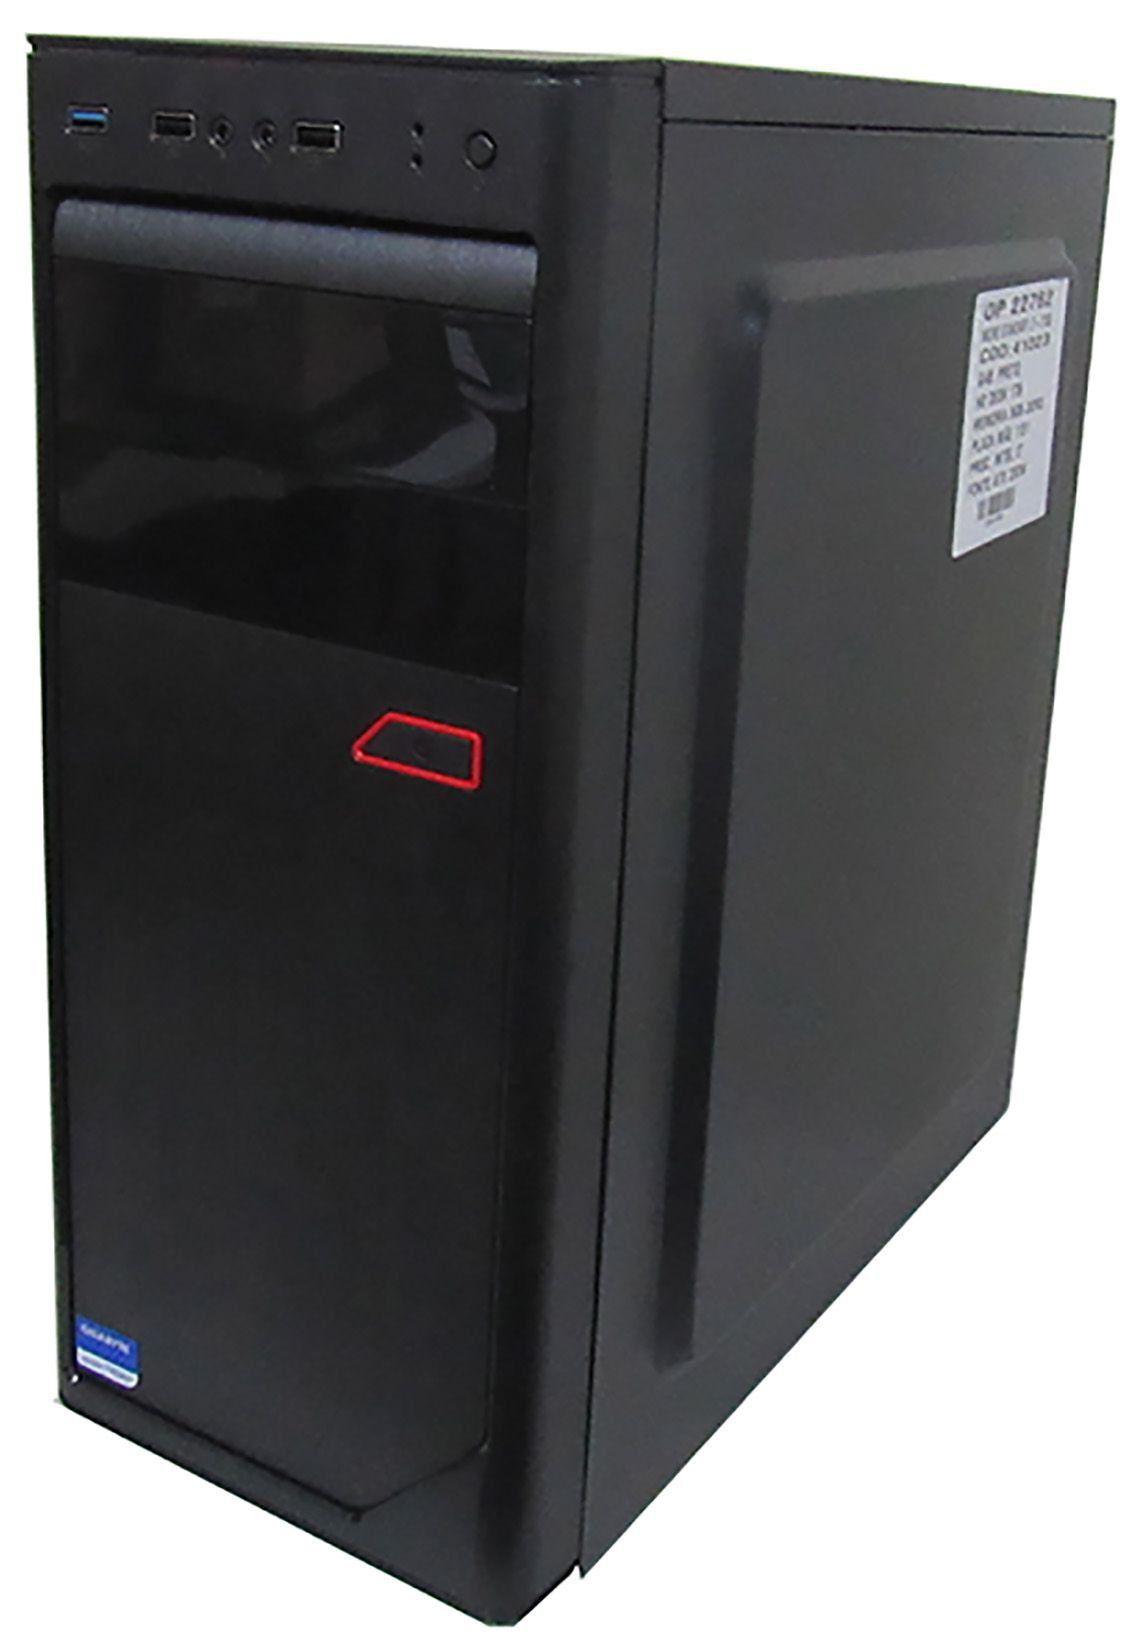 Computador Core i5 4GB 1TB + Gravador/Teclado/Mouse/Caixa de Som RR29